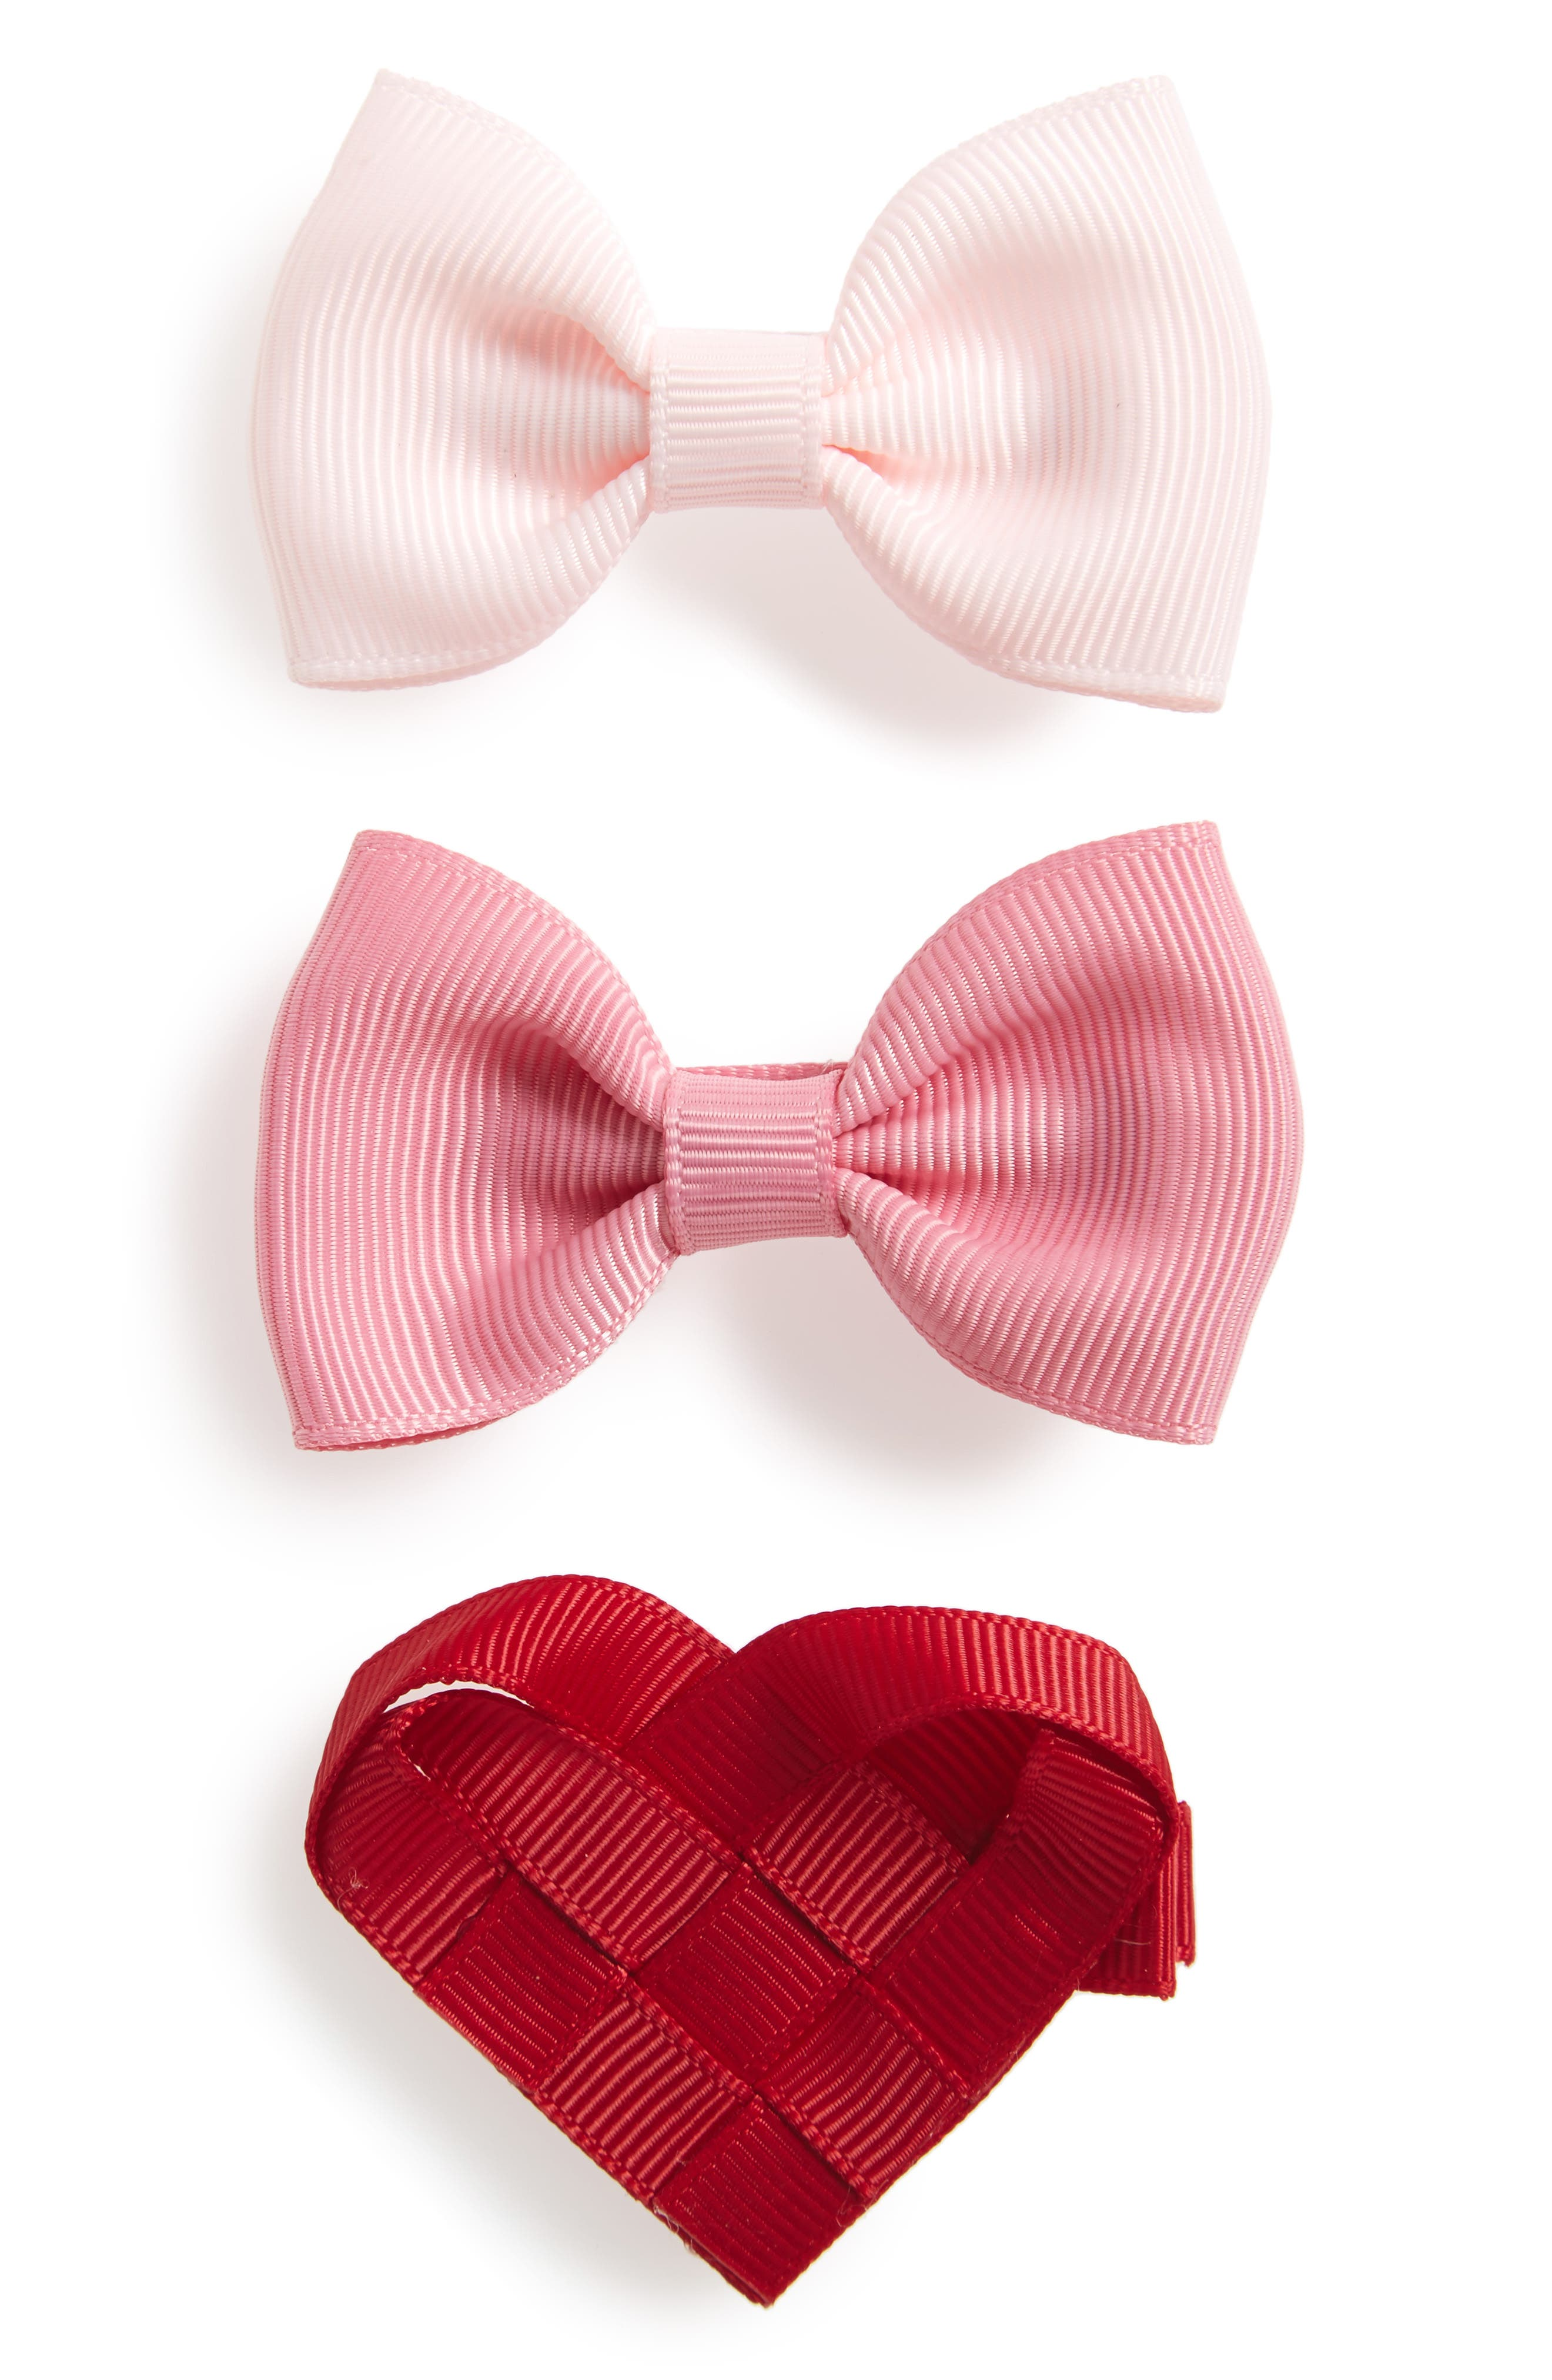 3-Piece Heart & Bows Hair Clip Set,                             Main thumbnail 1, color,                             650